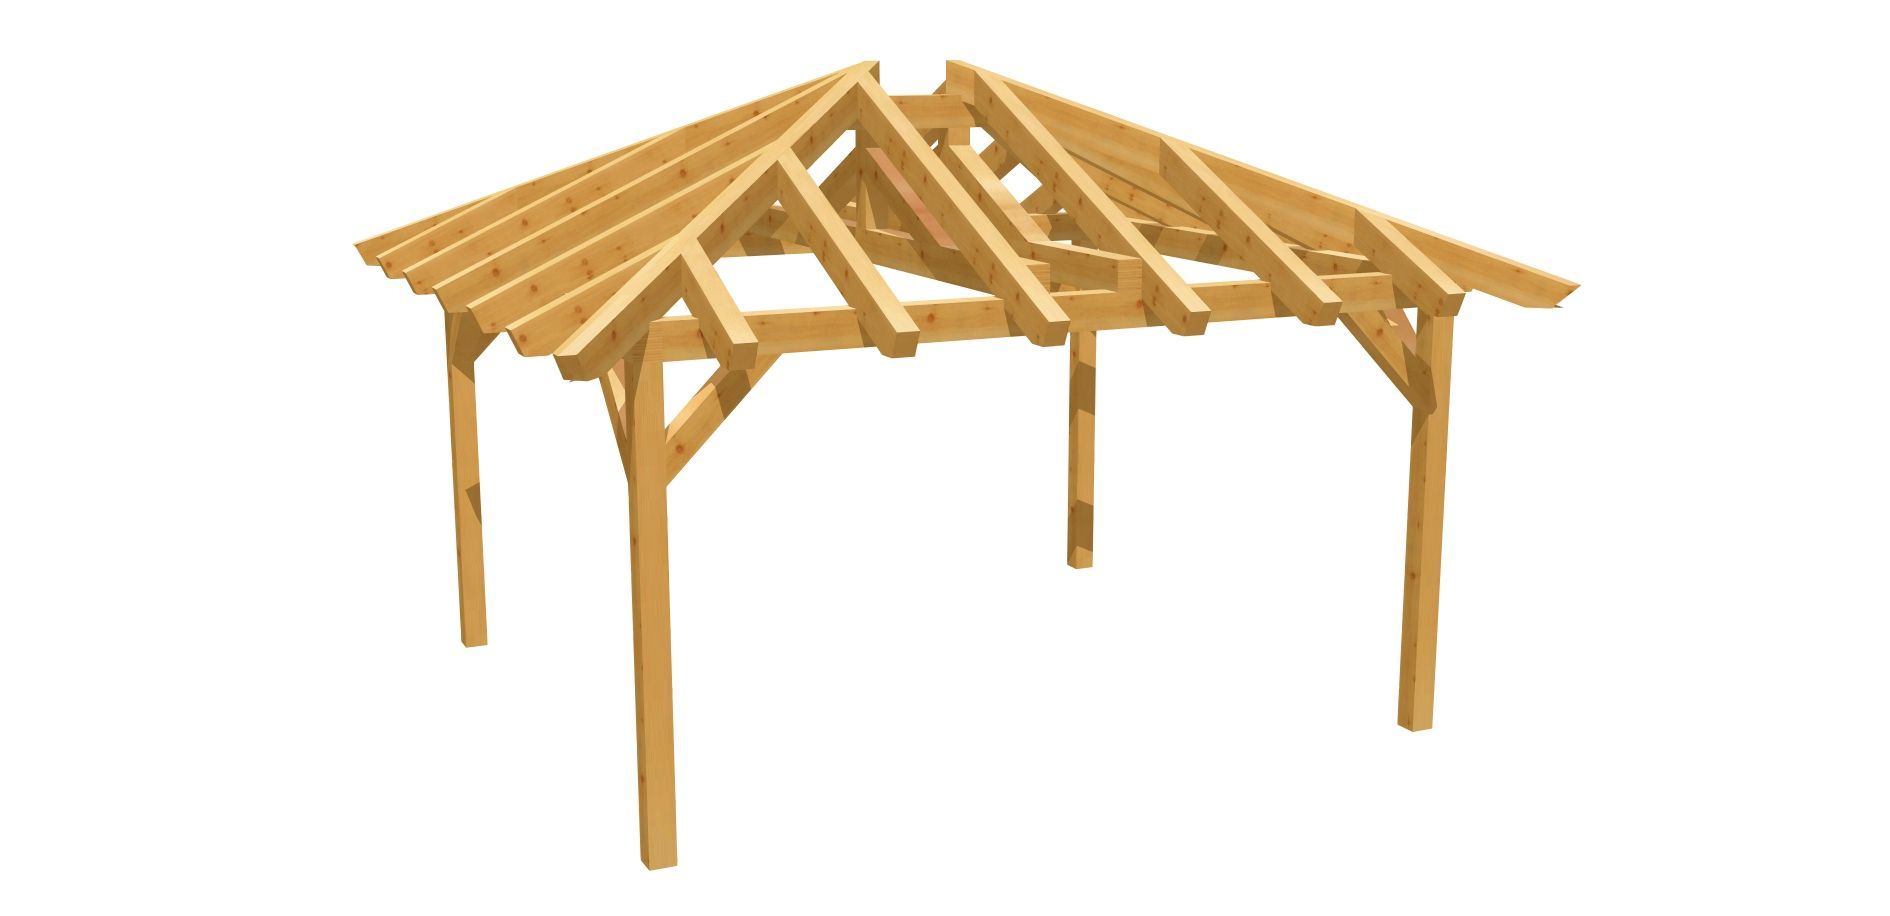 Carport Walmdach 4m X 3 50m Selber Bauen In 2020 Carport Selber Bauen Gartenhaus Selber Bauen Selber Bauen Holz